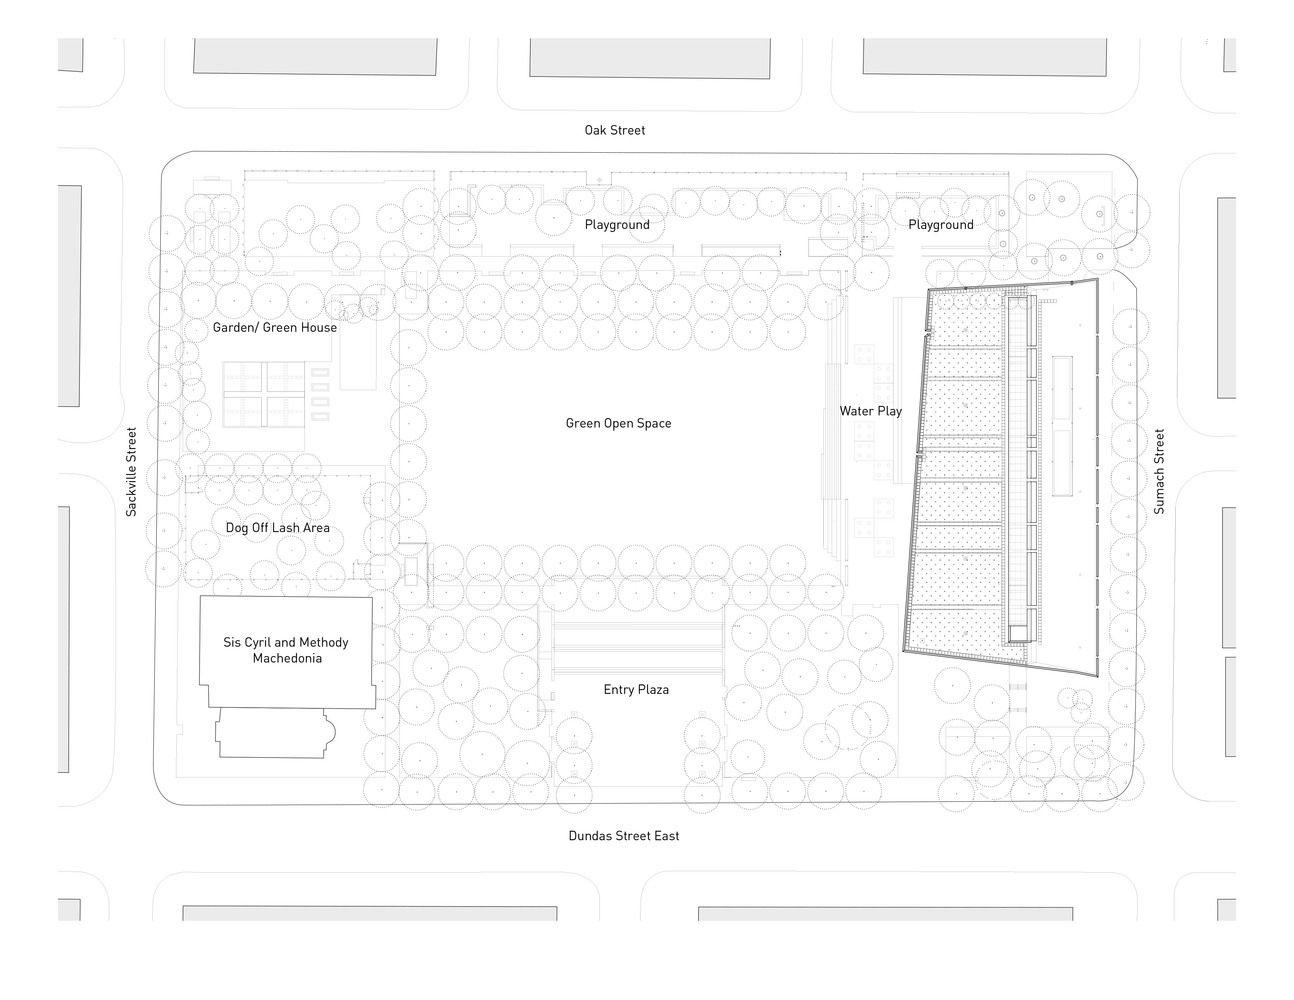 Gallery Of Regent Park Aquatic Centre Maclennan Jaunkalns Miller Architects 12 Regents Park Architect Site Plan